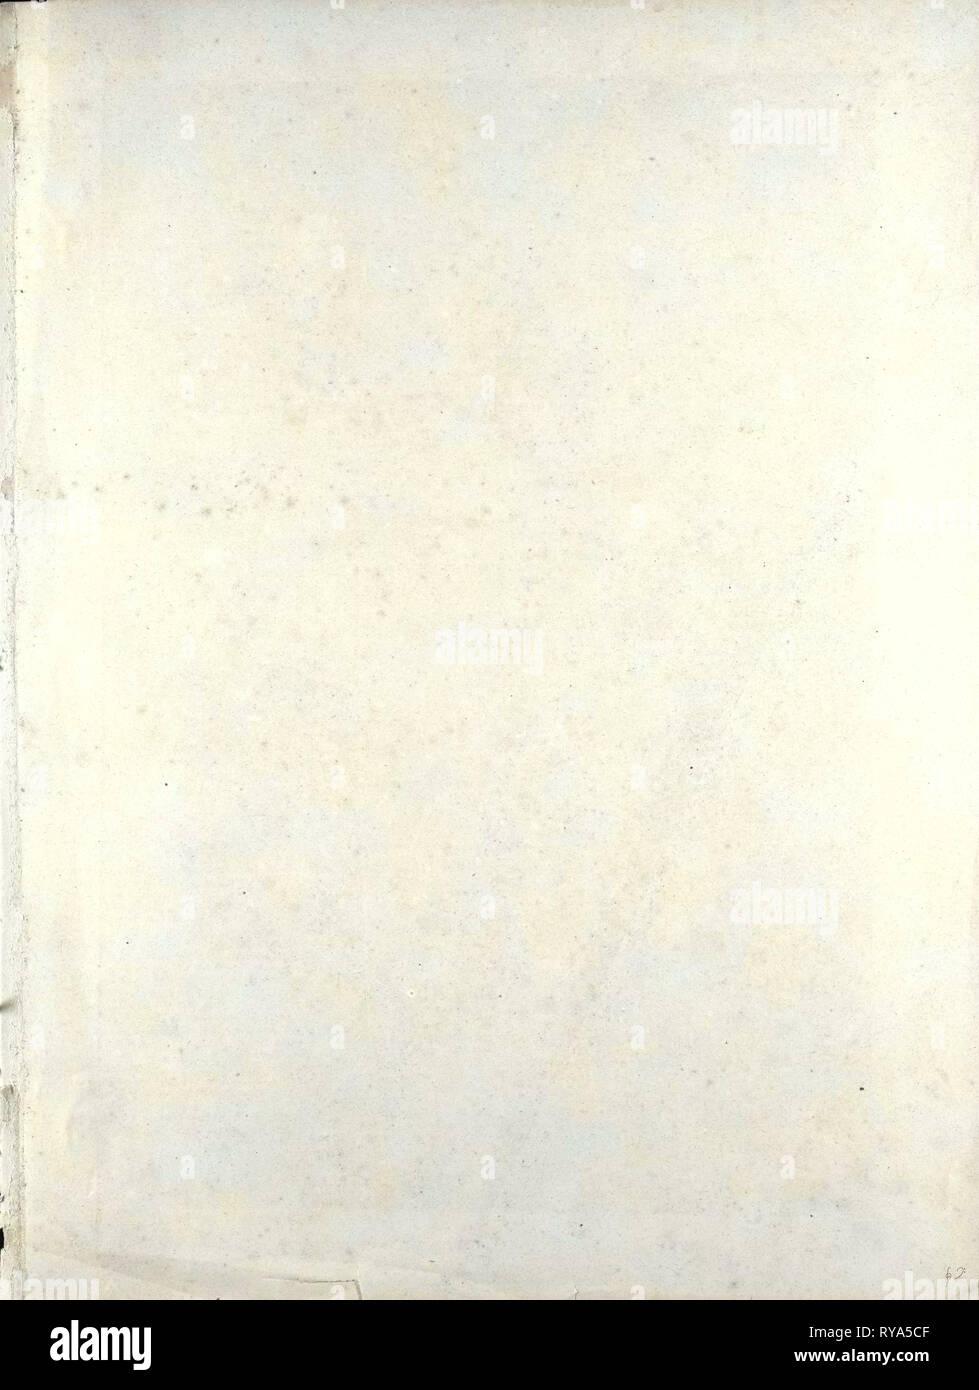 Vintage Background - Stock Image